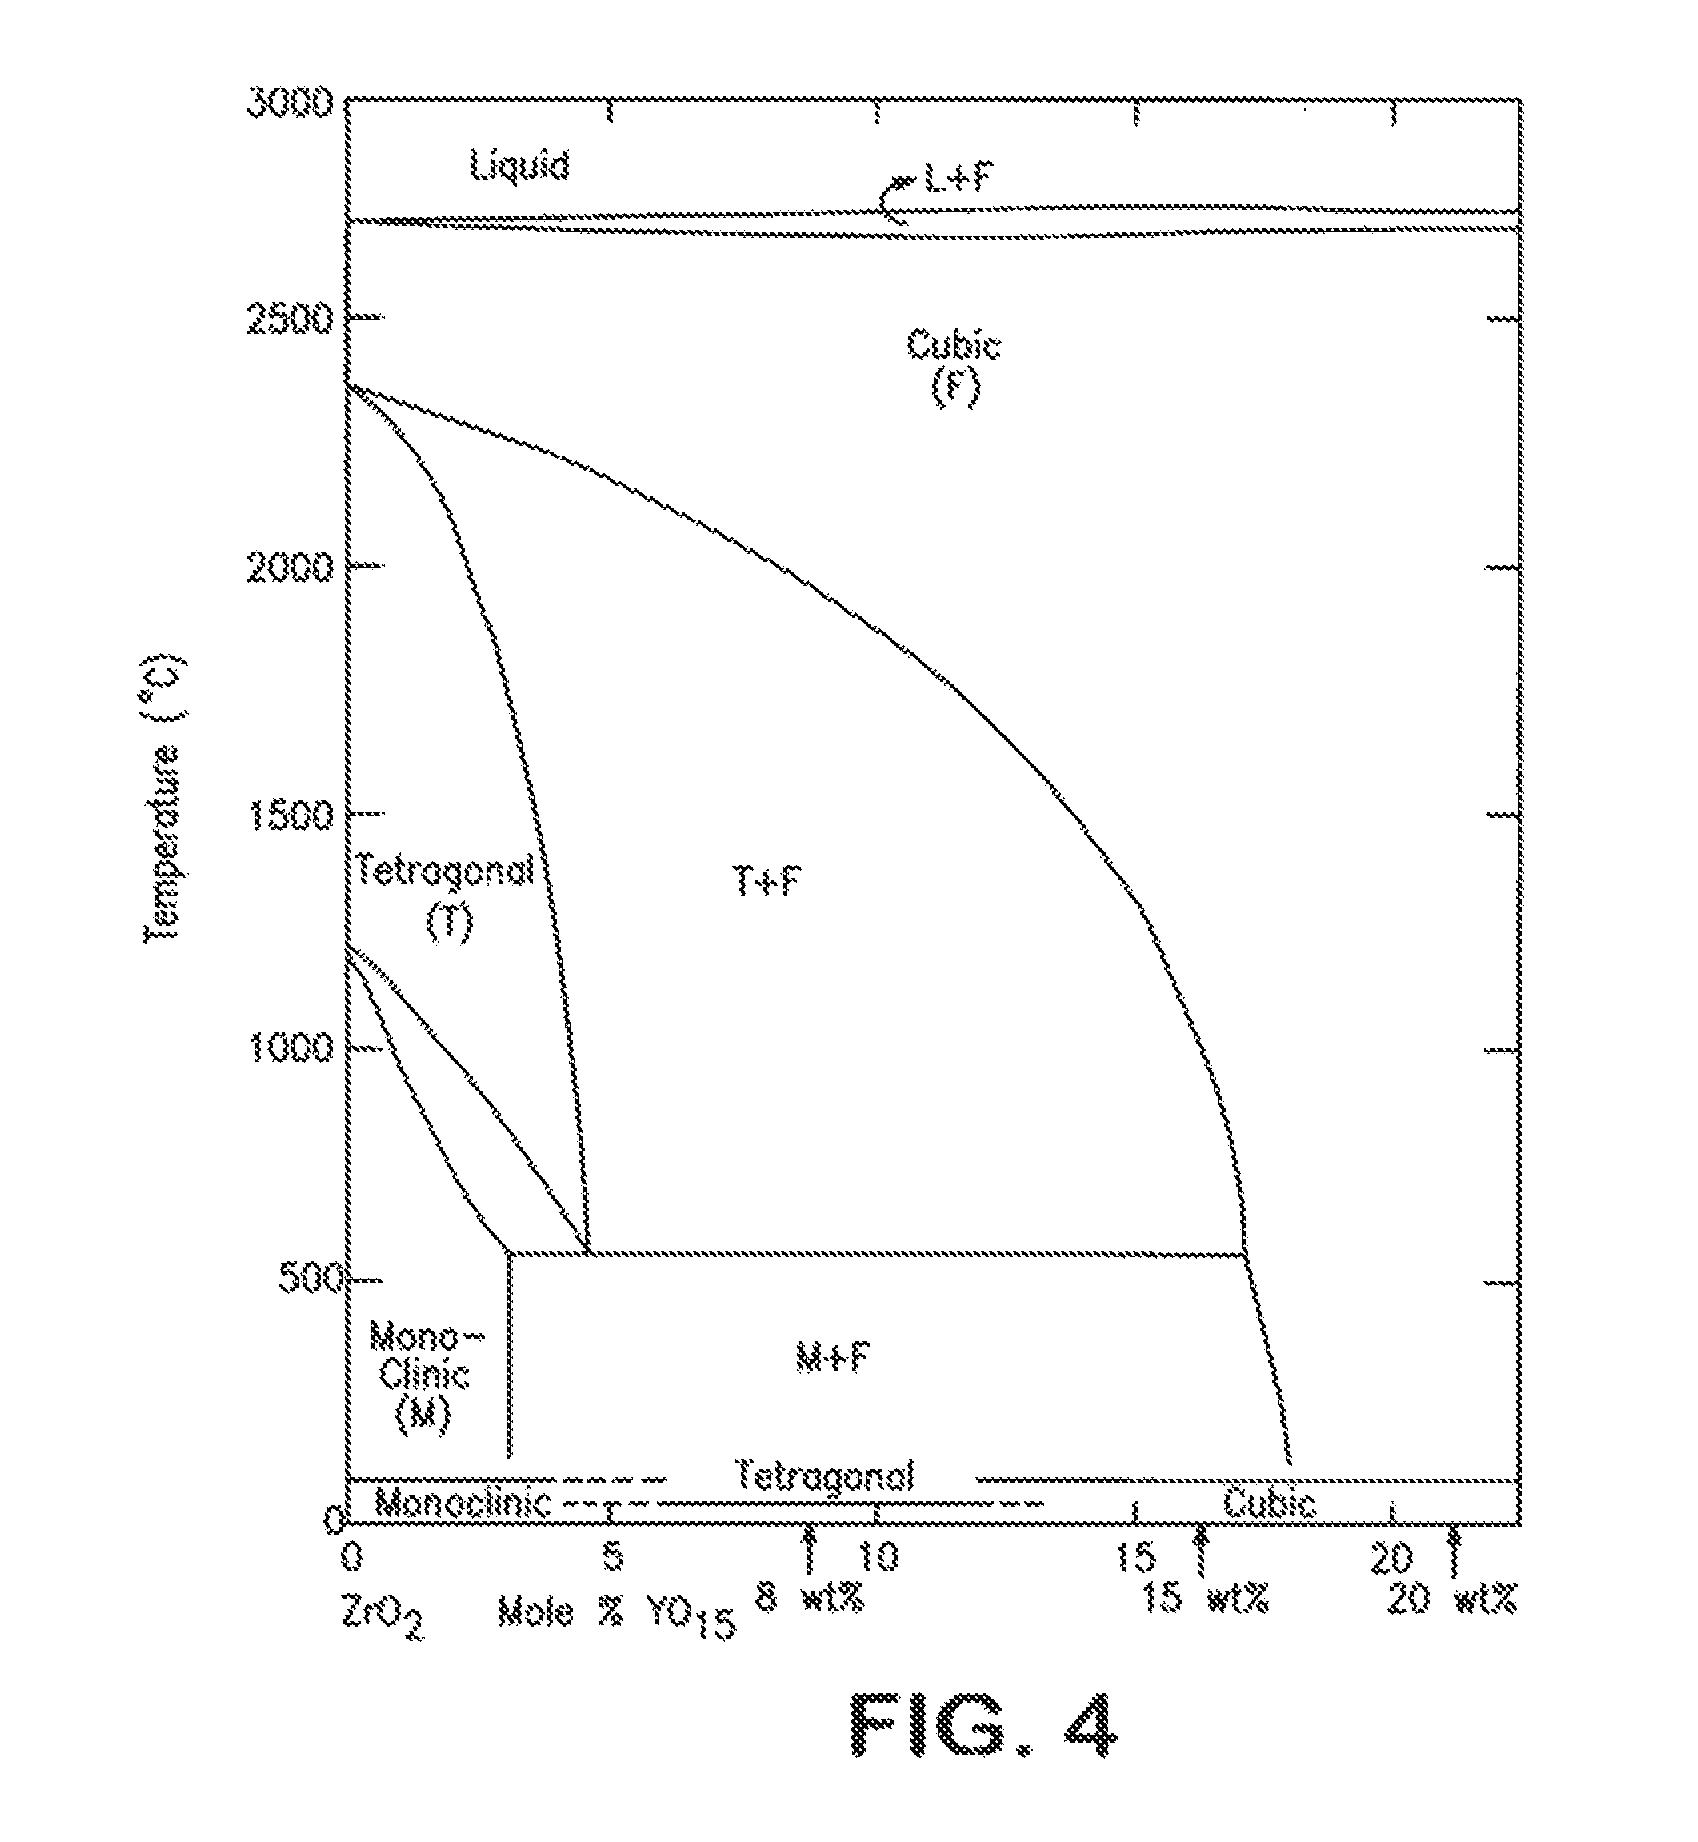 hight resolution of iron zirconium phase diagram wiring diagrams wni aluminium copper alloy phase diagram aluminum silicon phase diagram